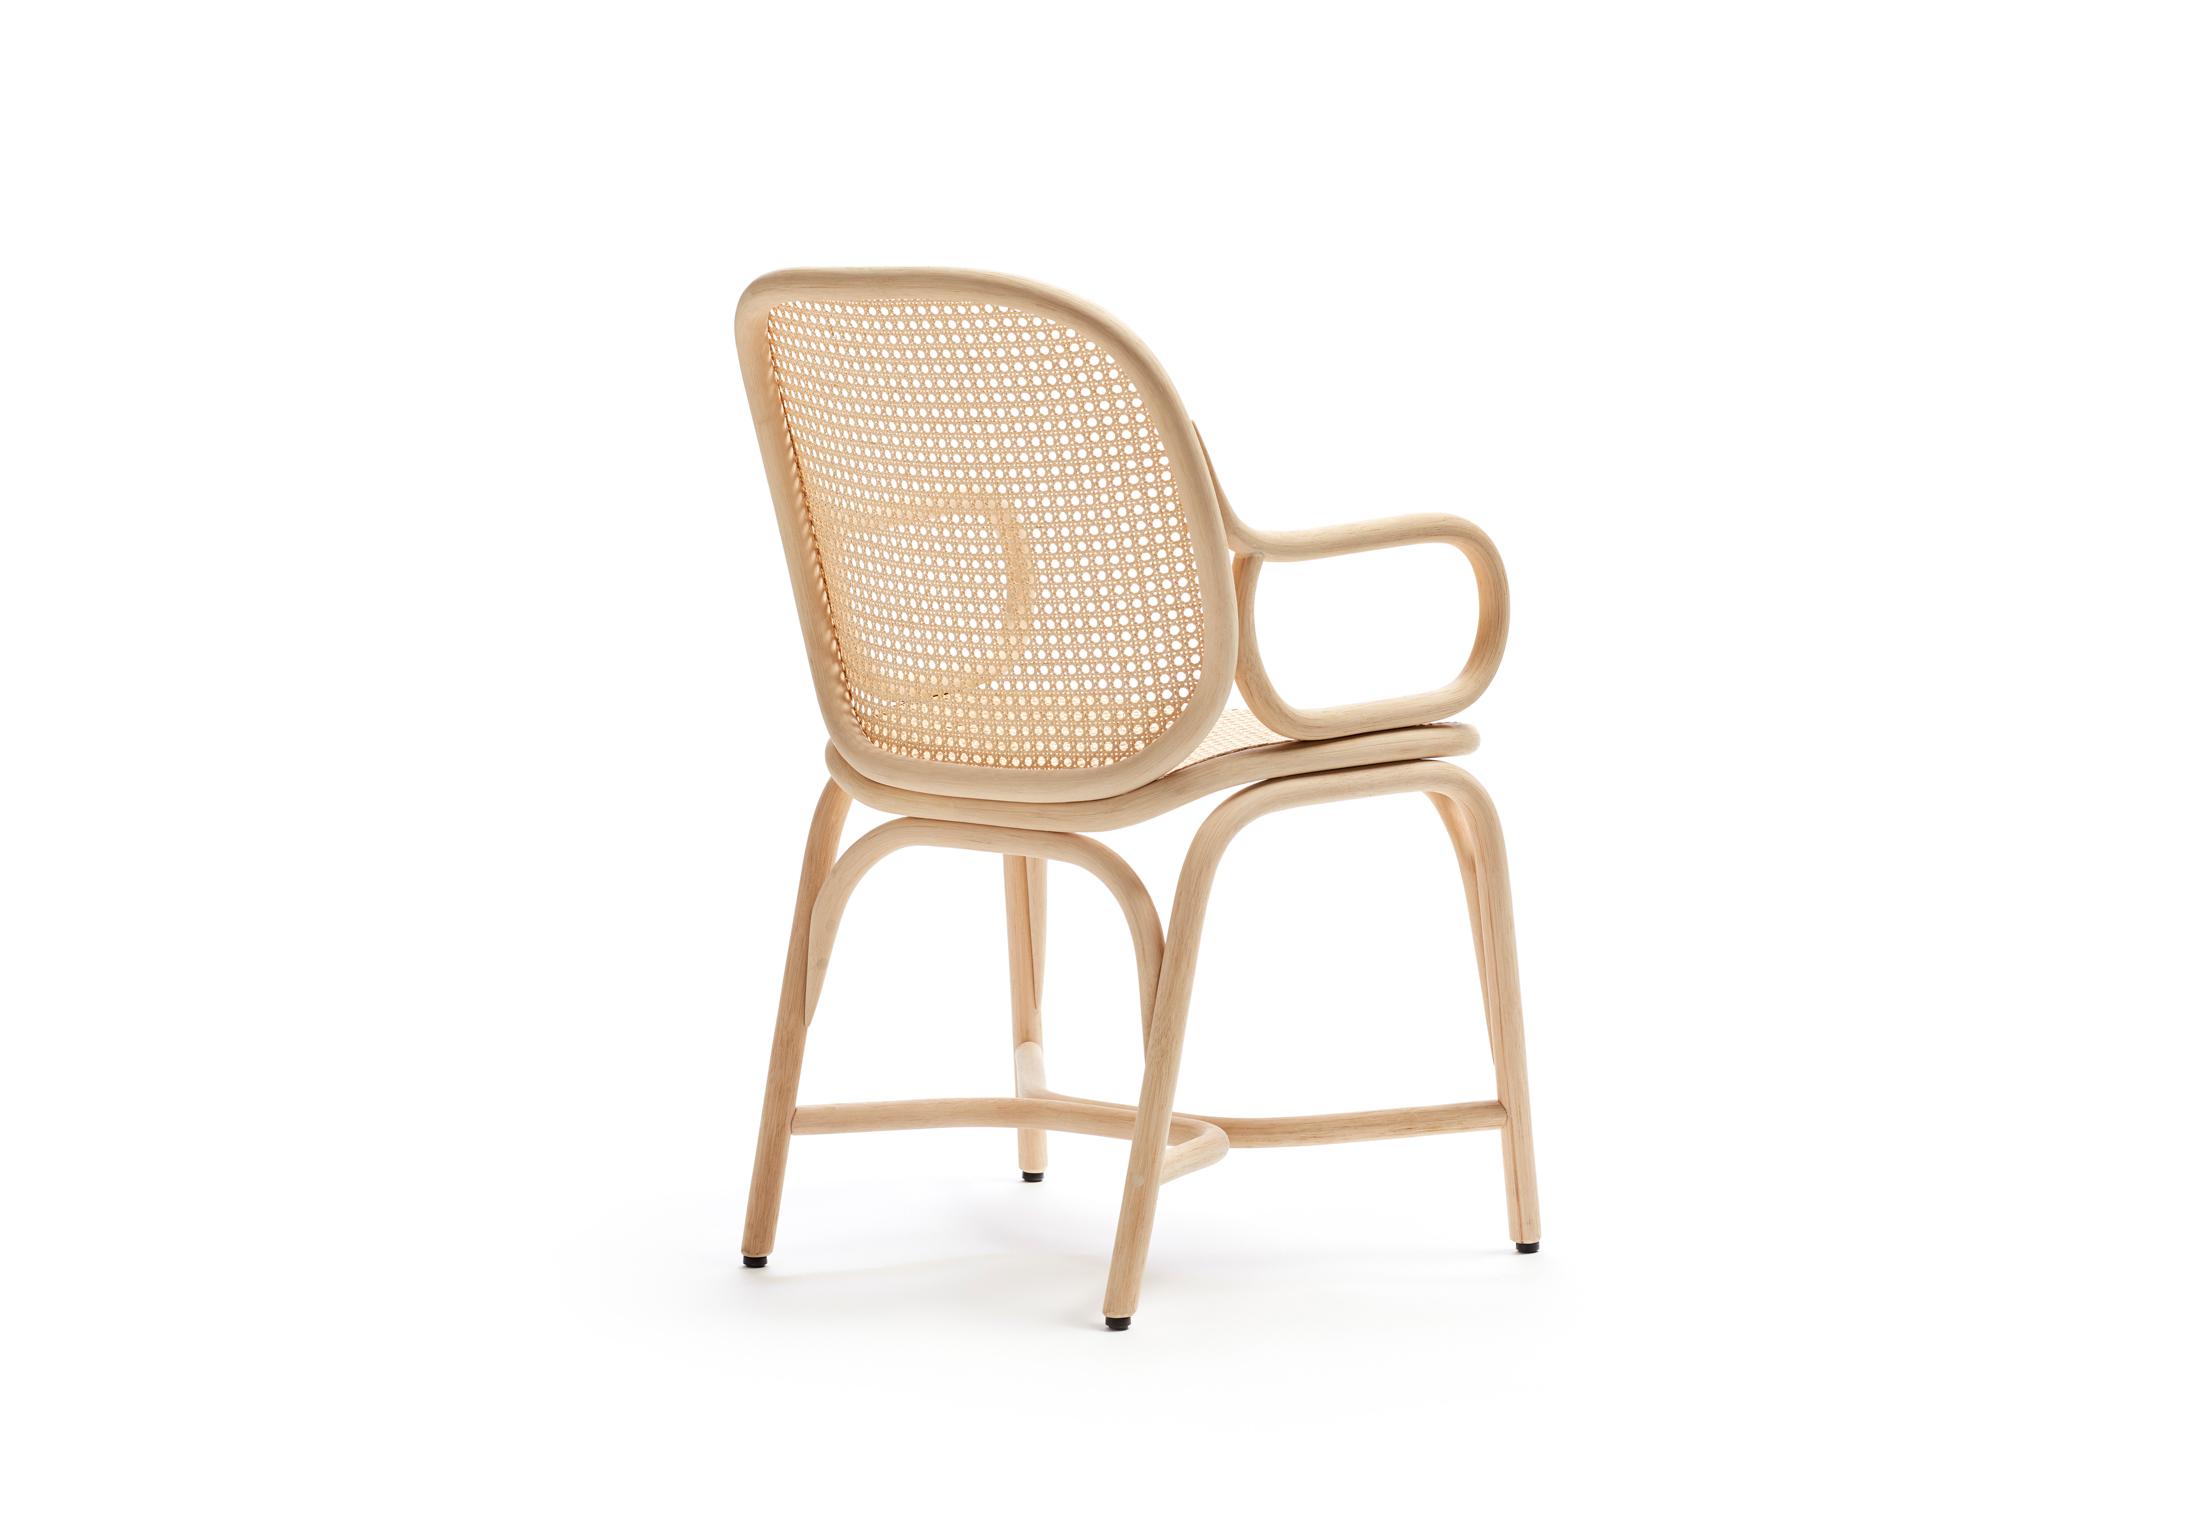 frames stuhl mit armlehne fussgestell in rattan t041 t. Black Bedroom Furniture Sets. Home Design Ideas